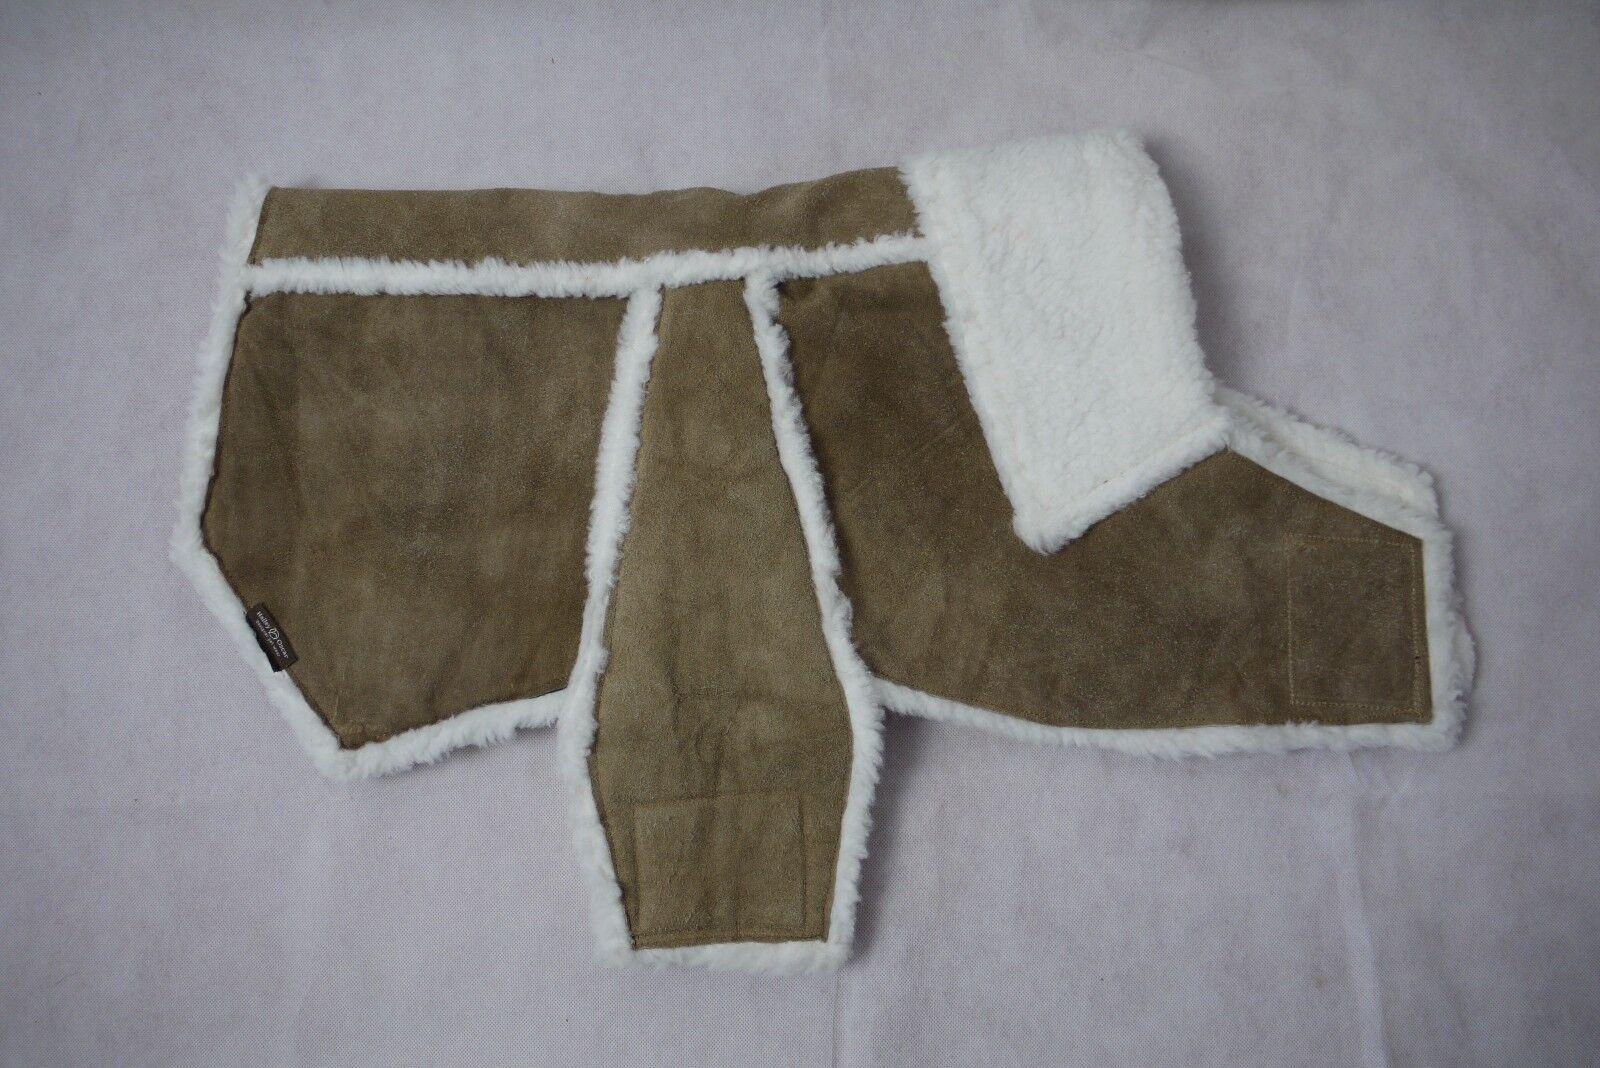 Hailey & Oscar Suede Leather Dog Coat Größe - XXL ( 27 - 33  Chest )